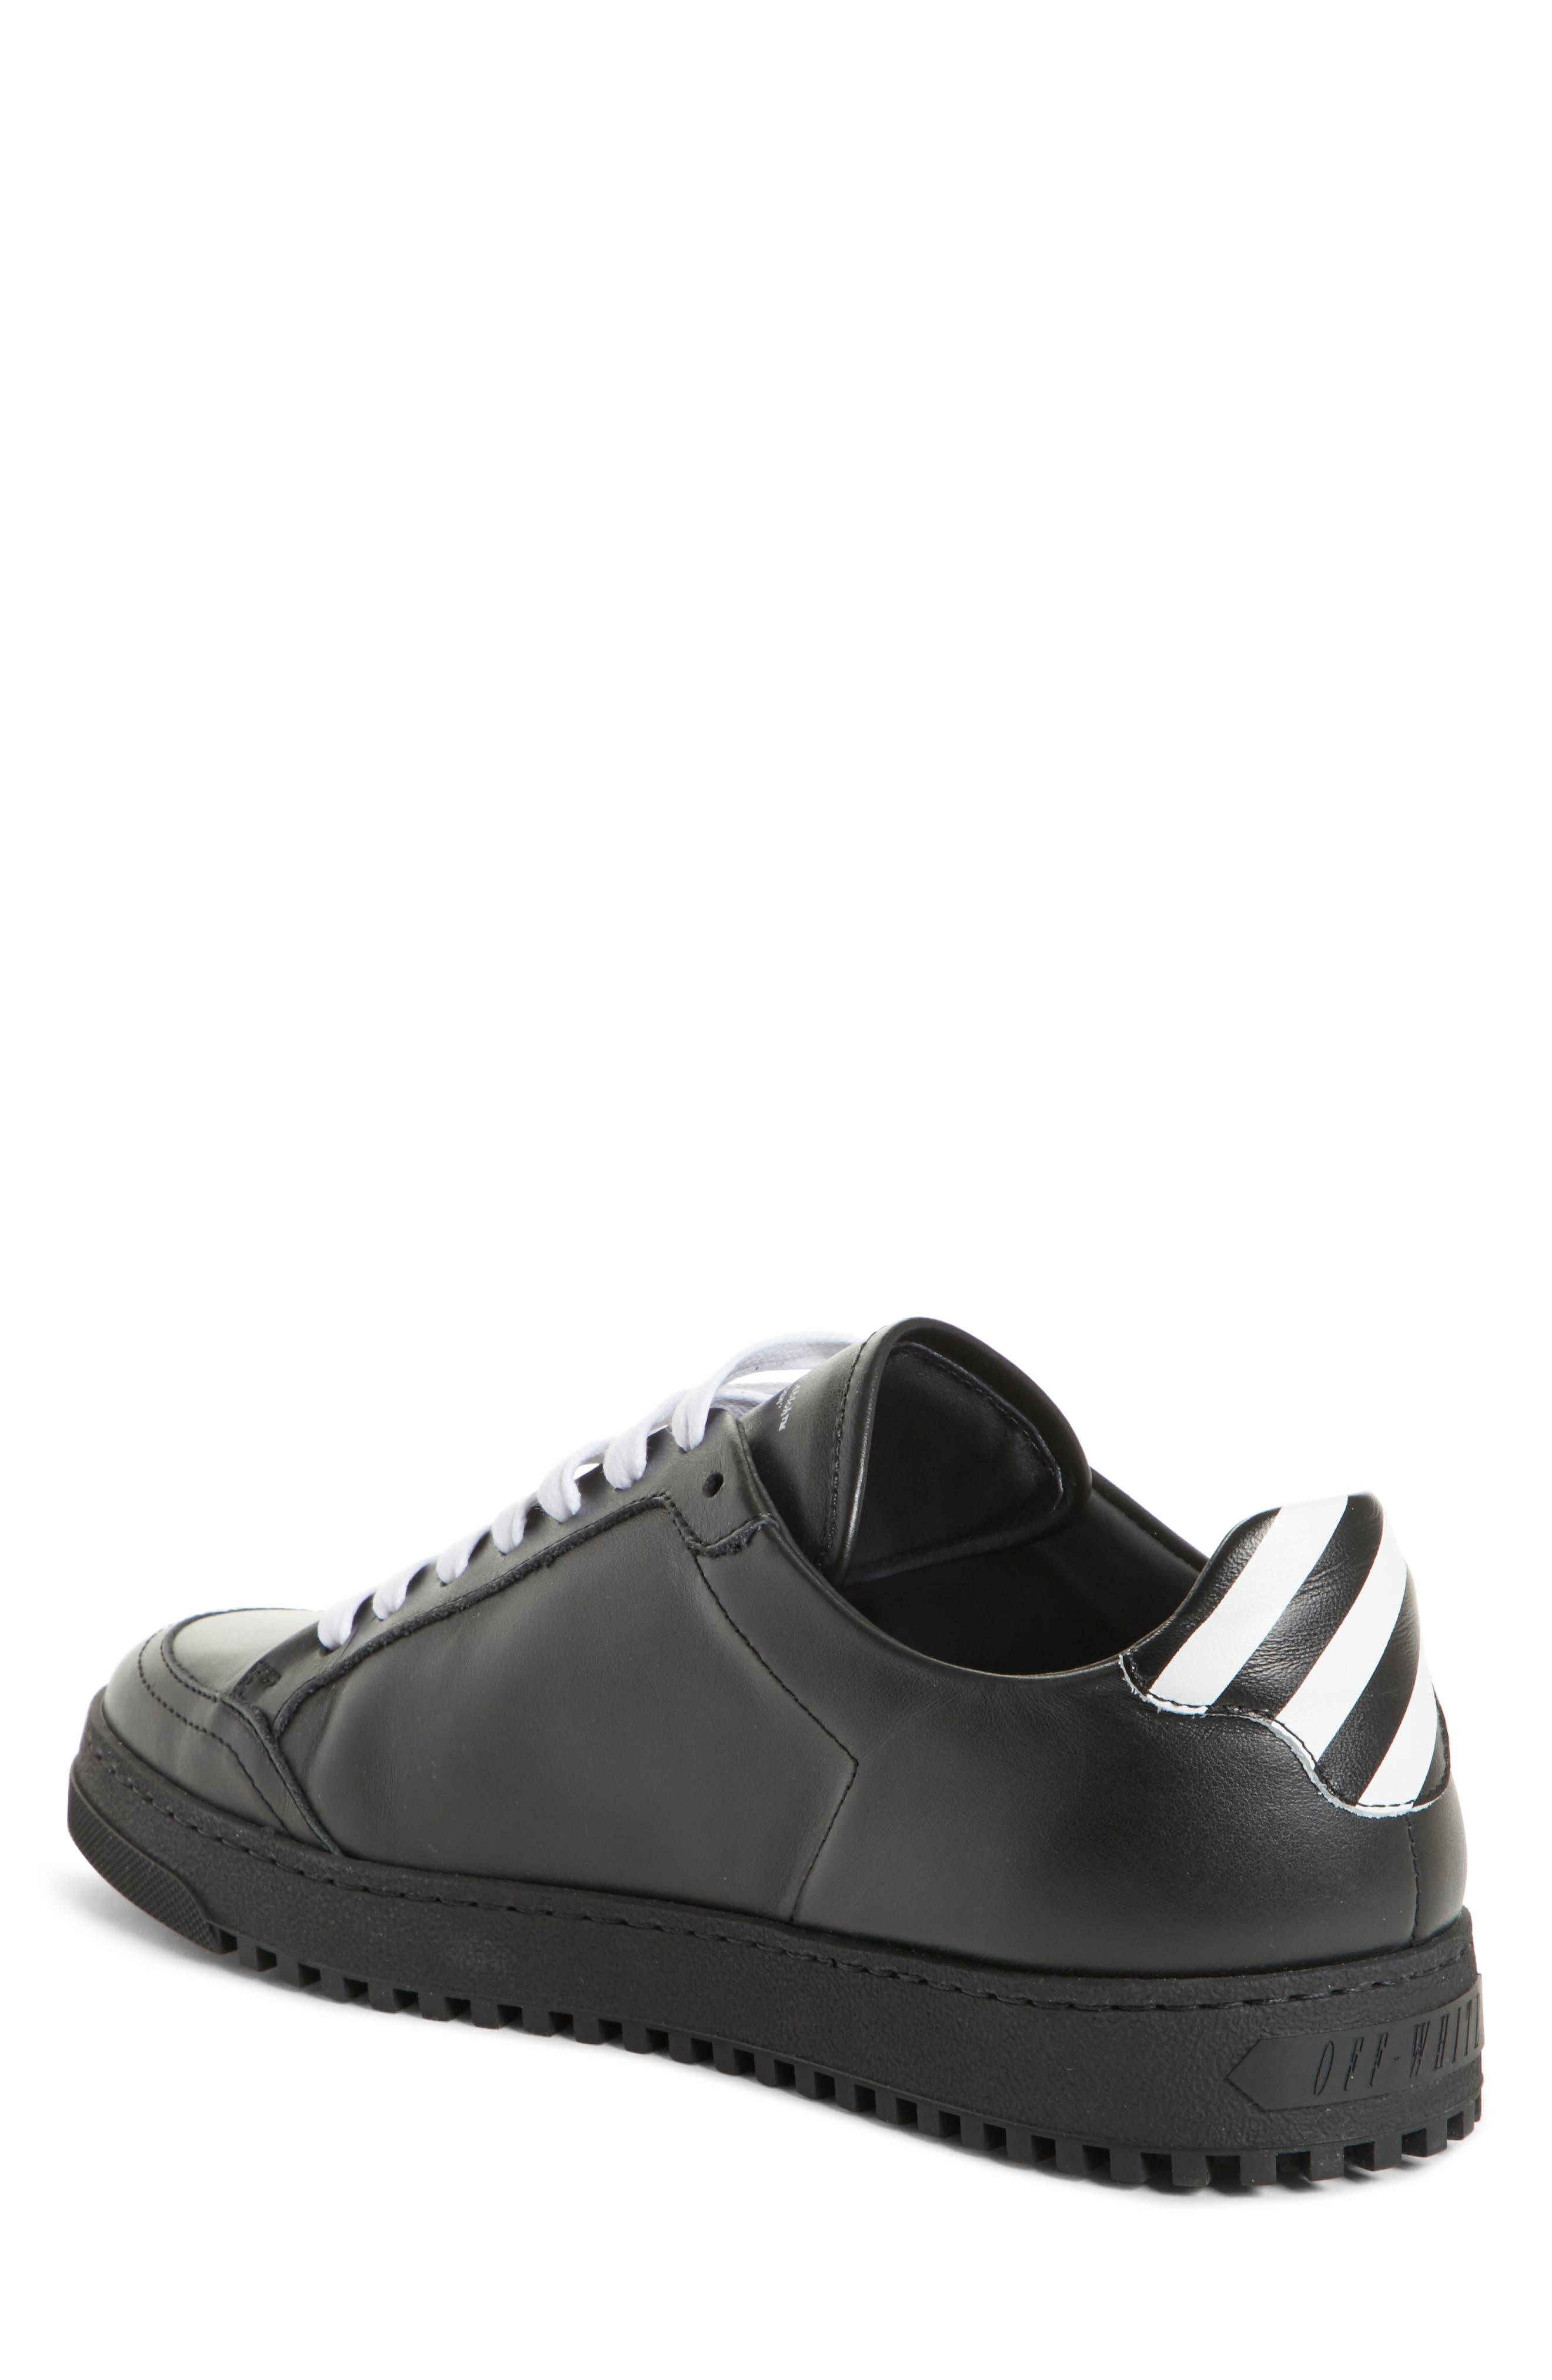 Arrow Sneaker,                             Alternate thumbnail 2, color,                             Black White